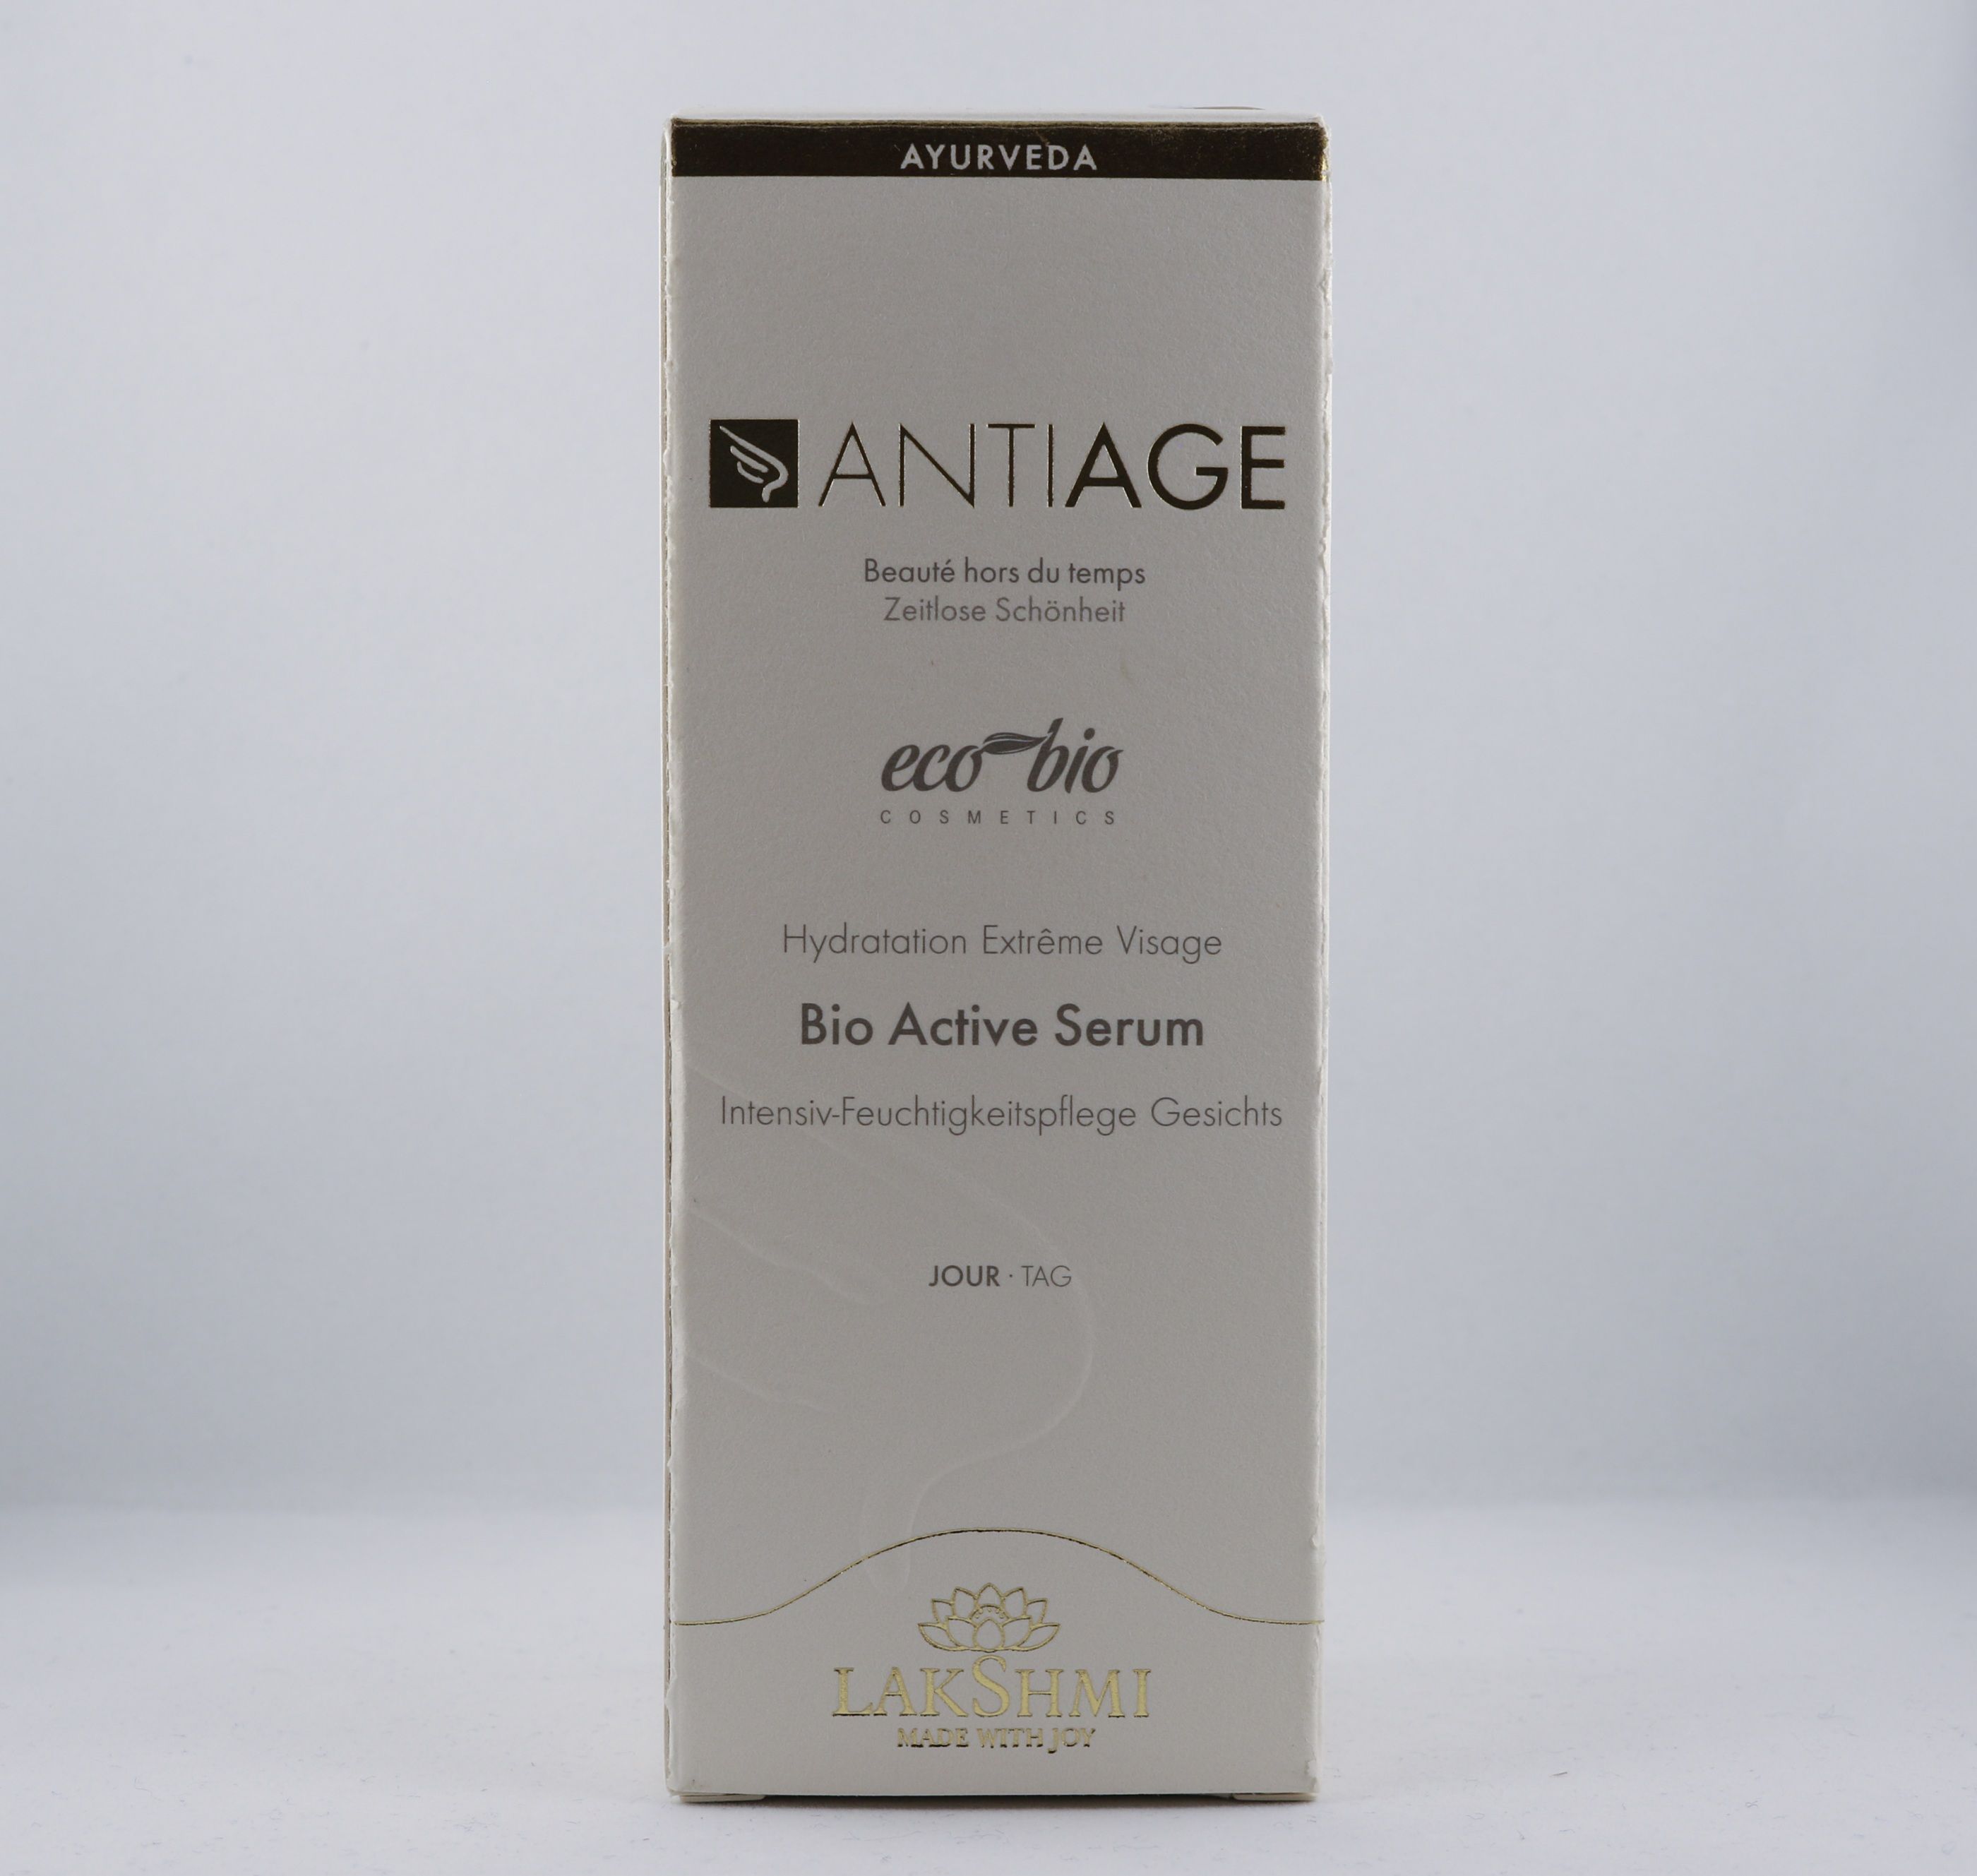 Anti-Age Bio Active Serum wellness ayurveda  halmstad sweden sverige